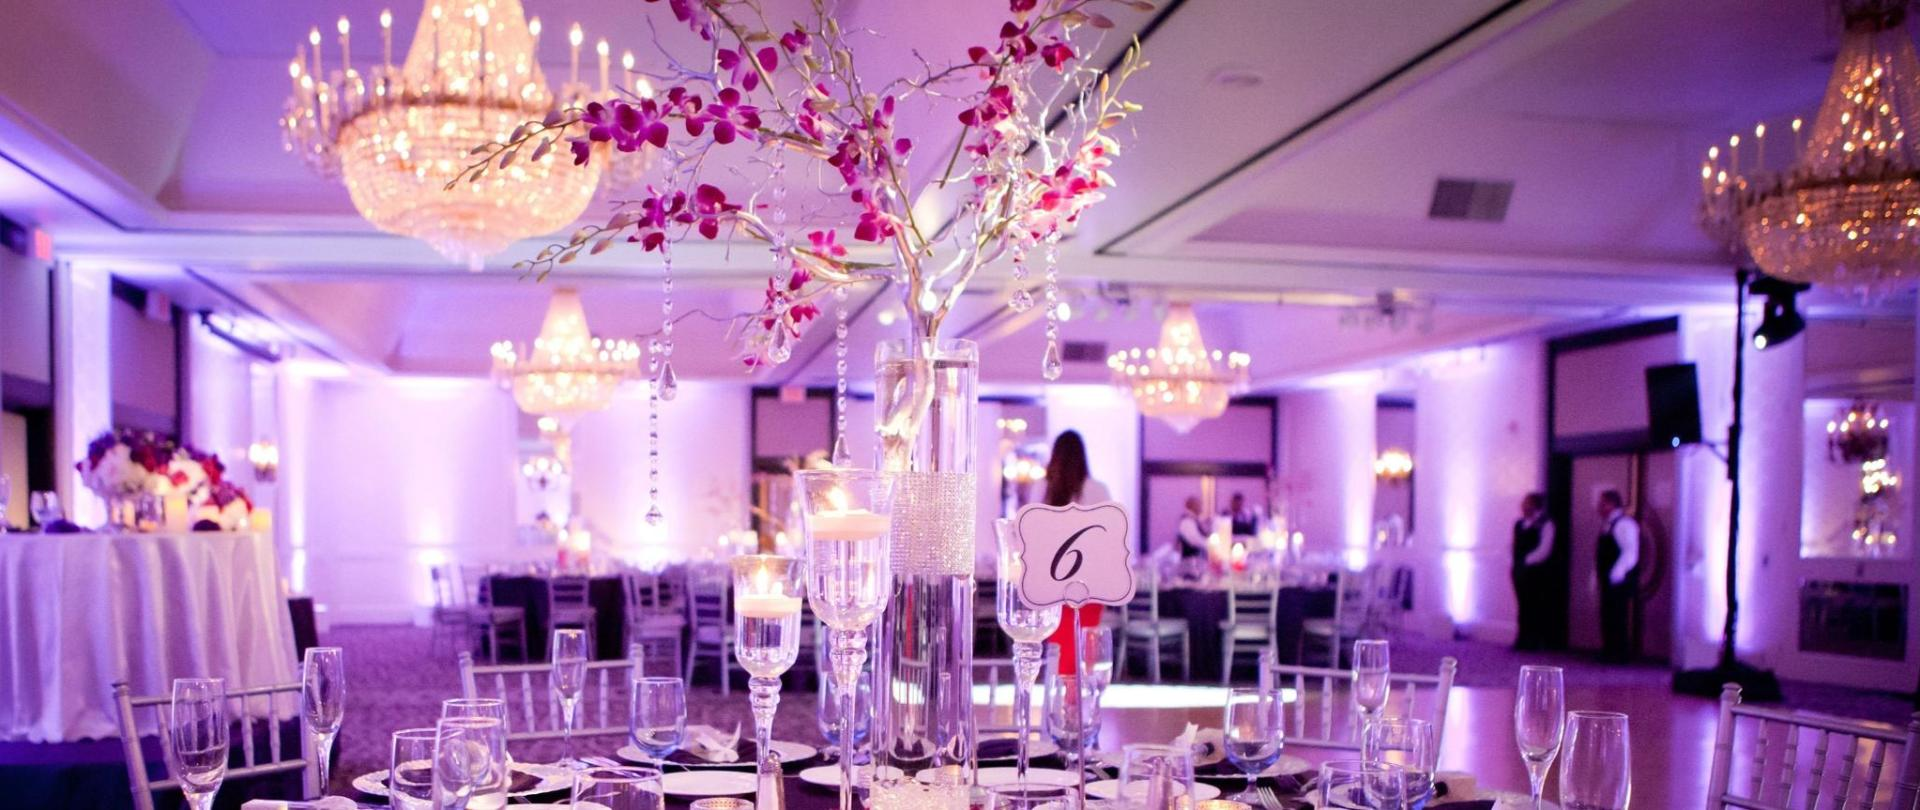 wedding_party-80.jpg